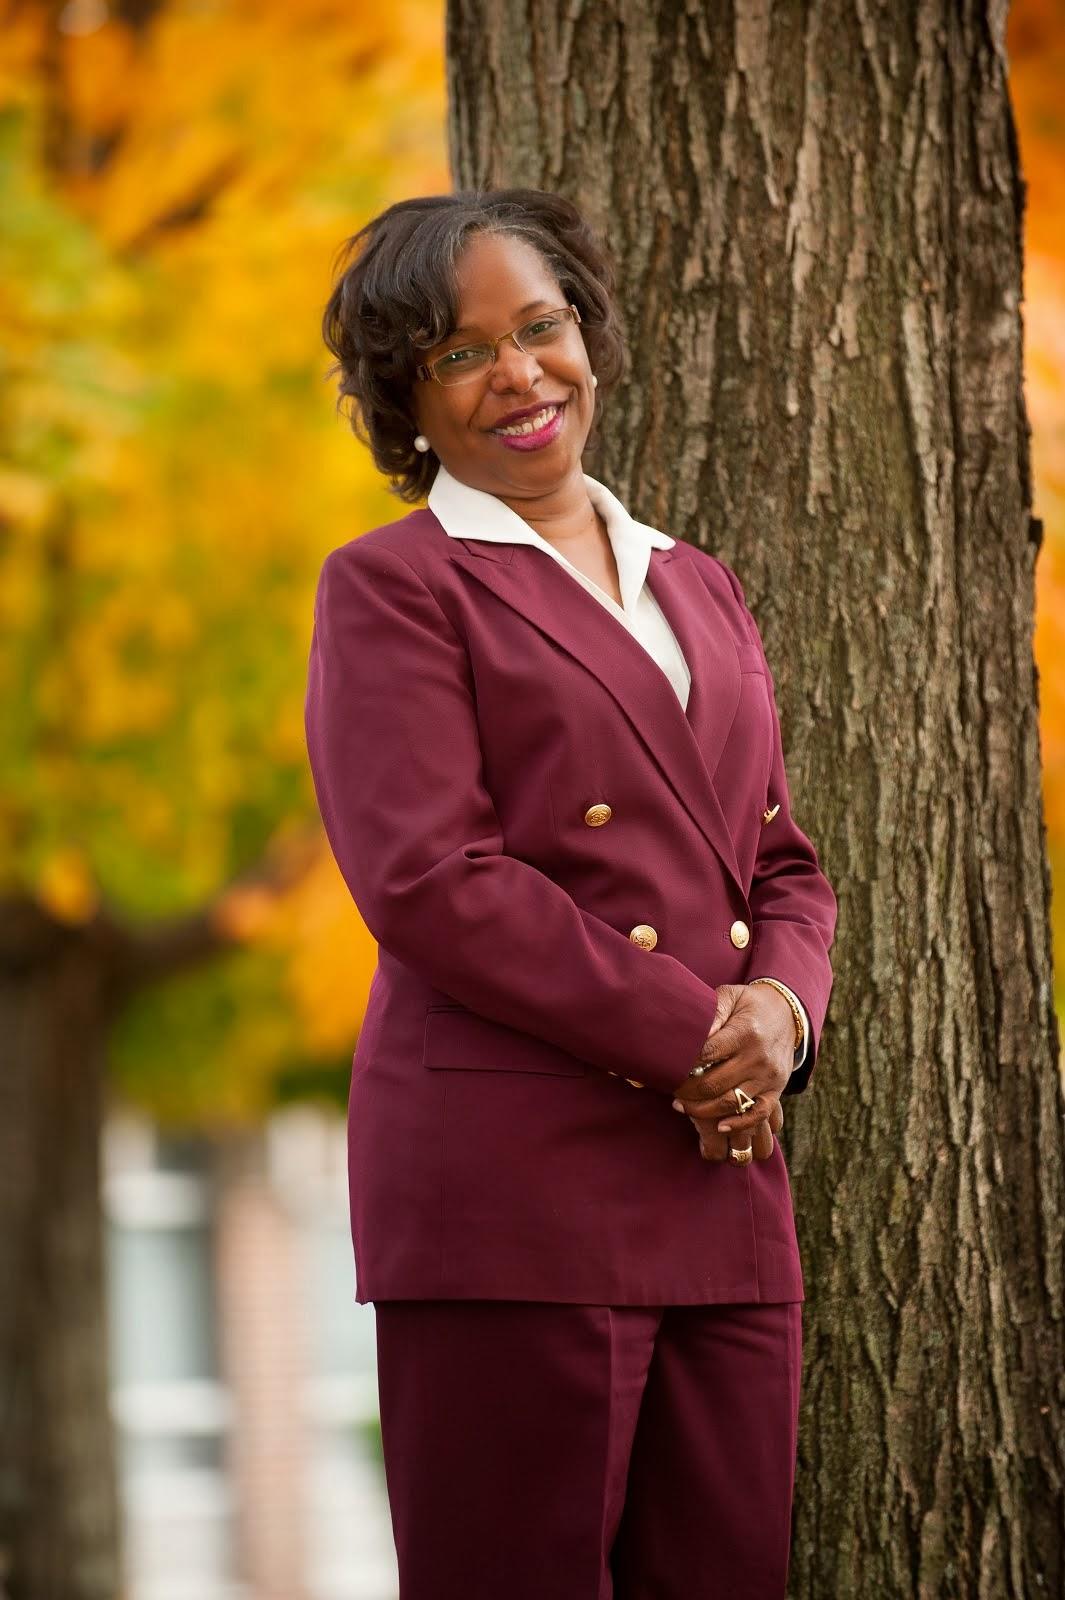 About Blog's Owner, Tonya Amankwatia, Ph.D.